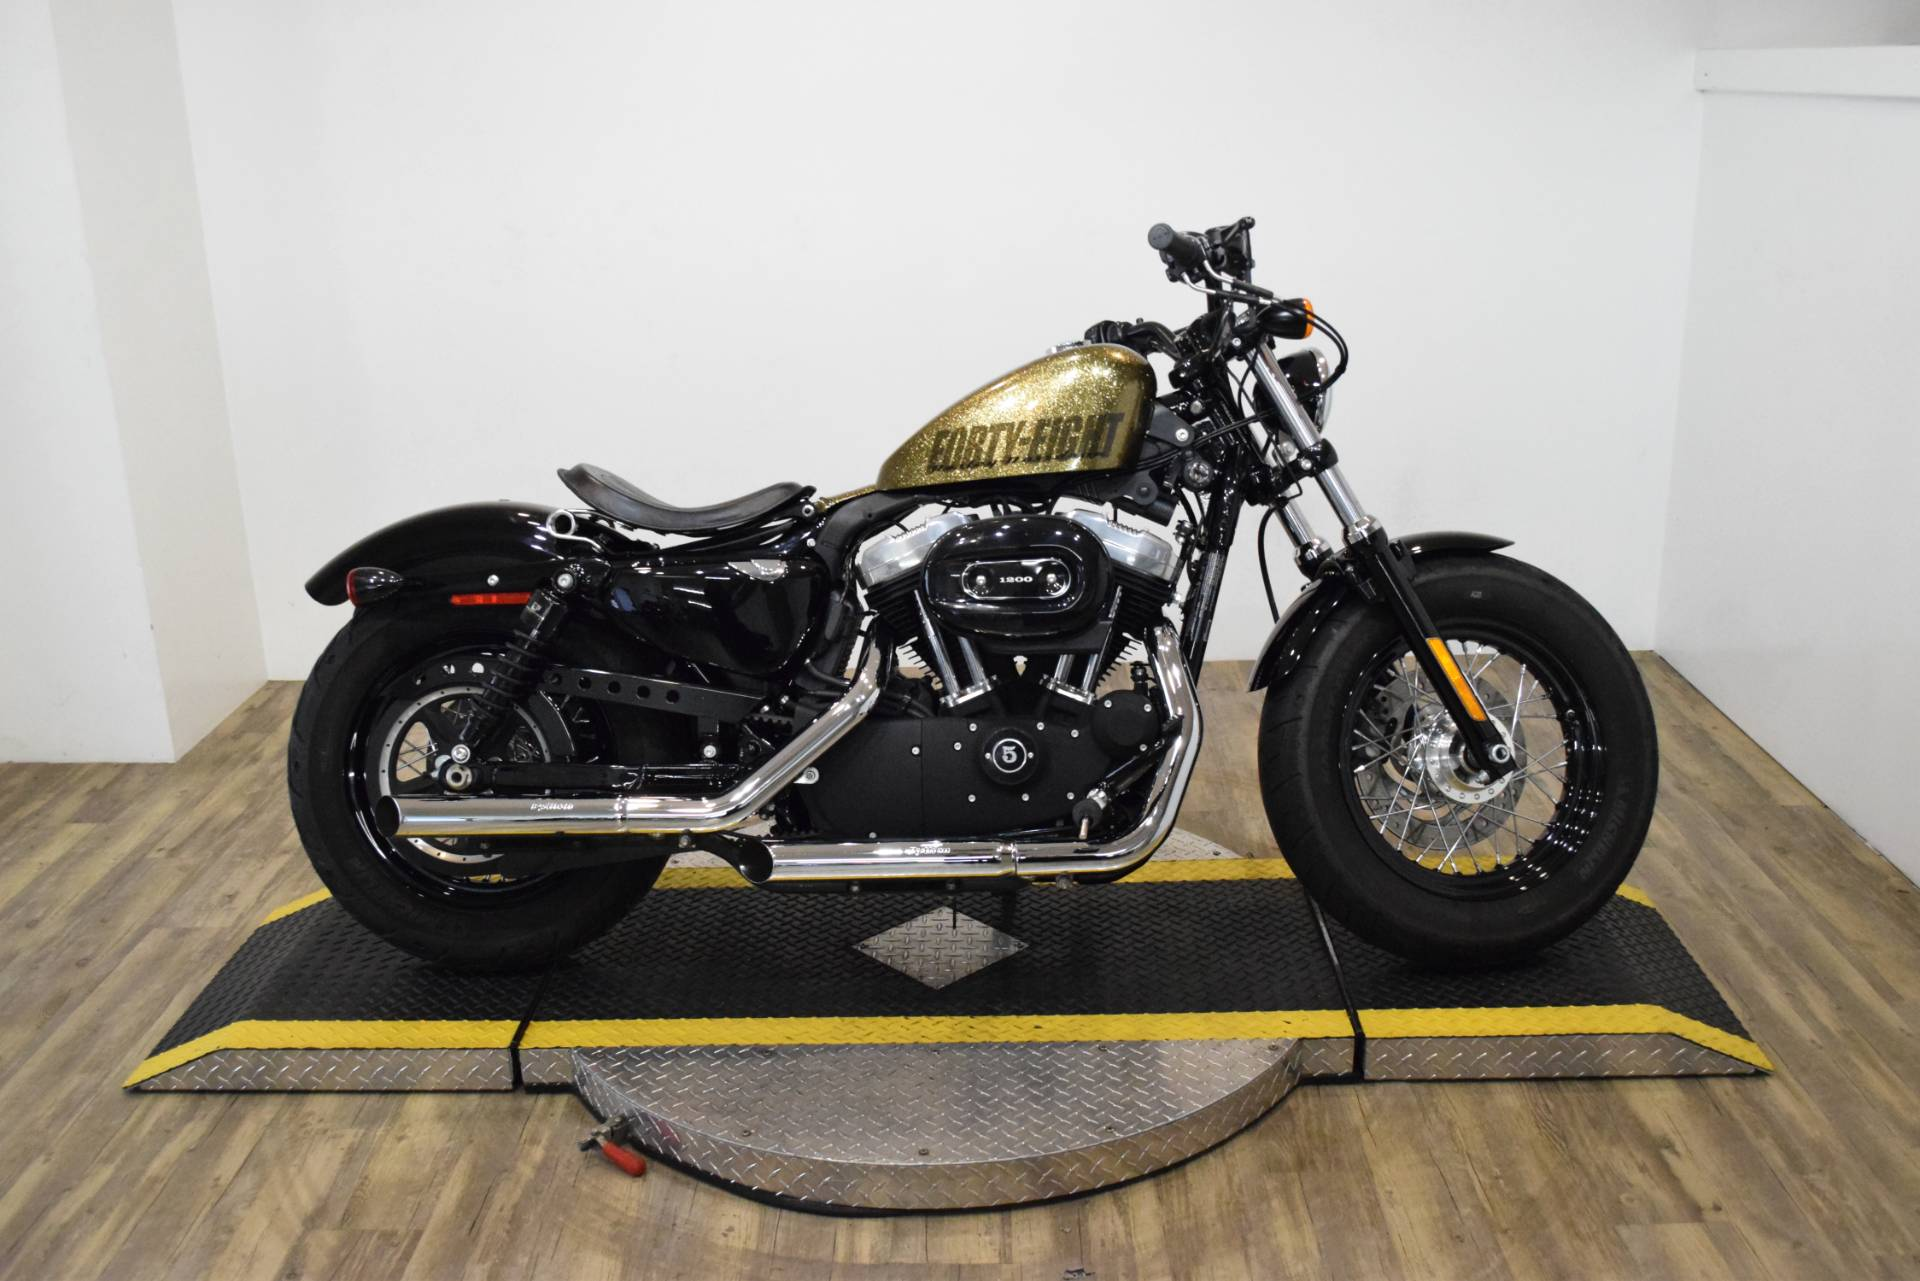 2013 Harley-Davidson Sportster Forty-Eight 1